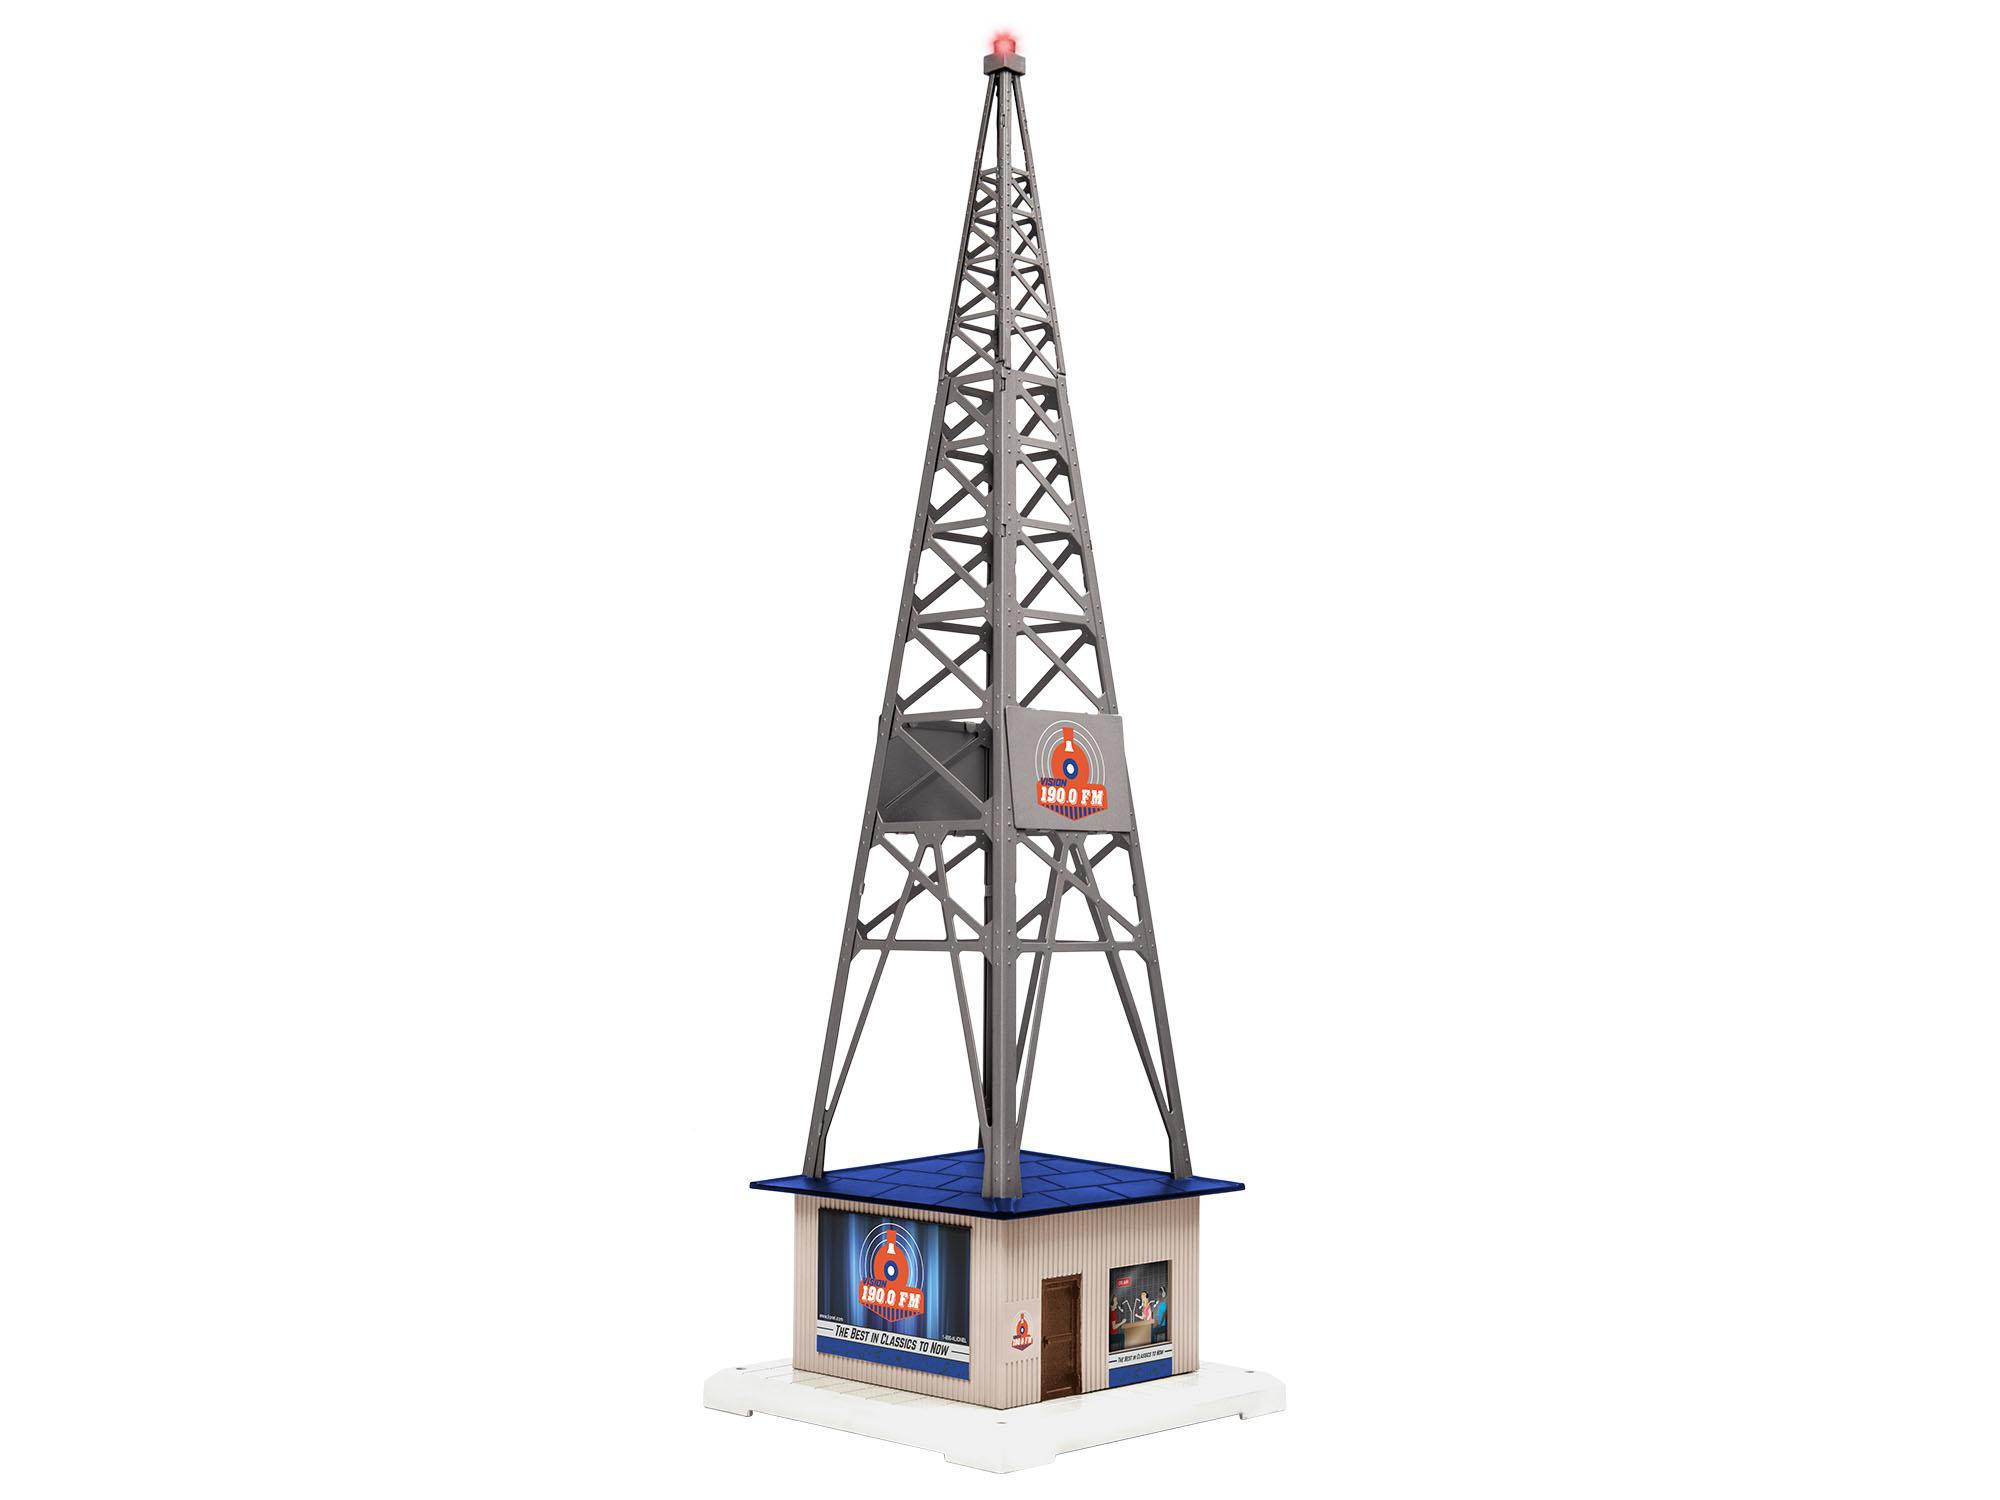 L84611 - LIONEL BT RADIO TOWER (17V2)